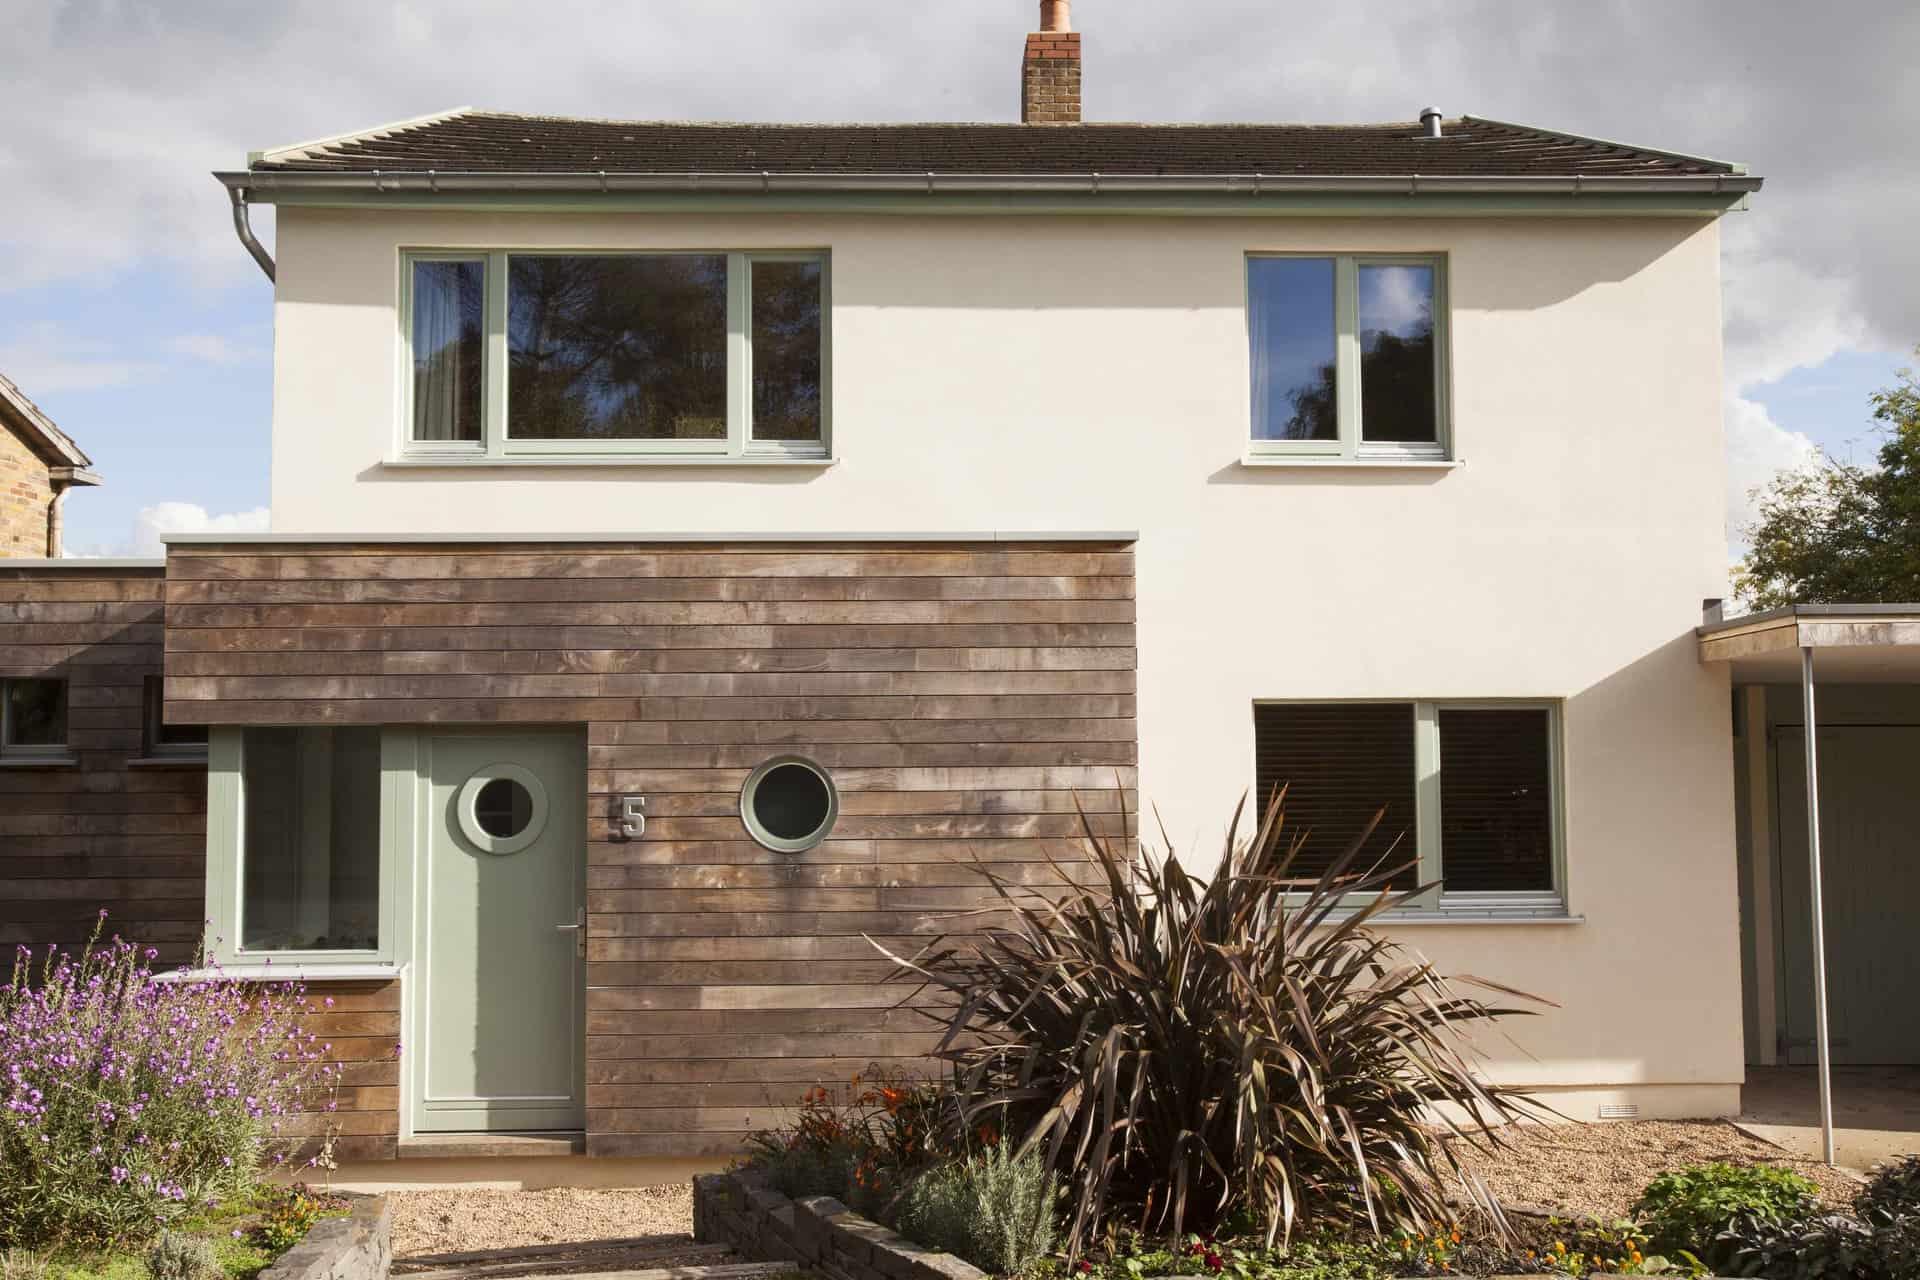 Four Walls retrofit with PERFORMANCE triple glazed windows and doors